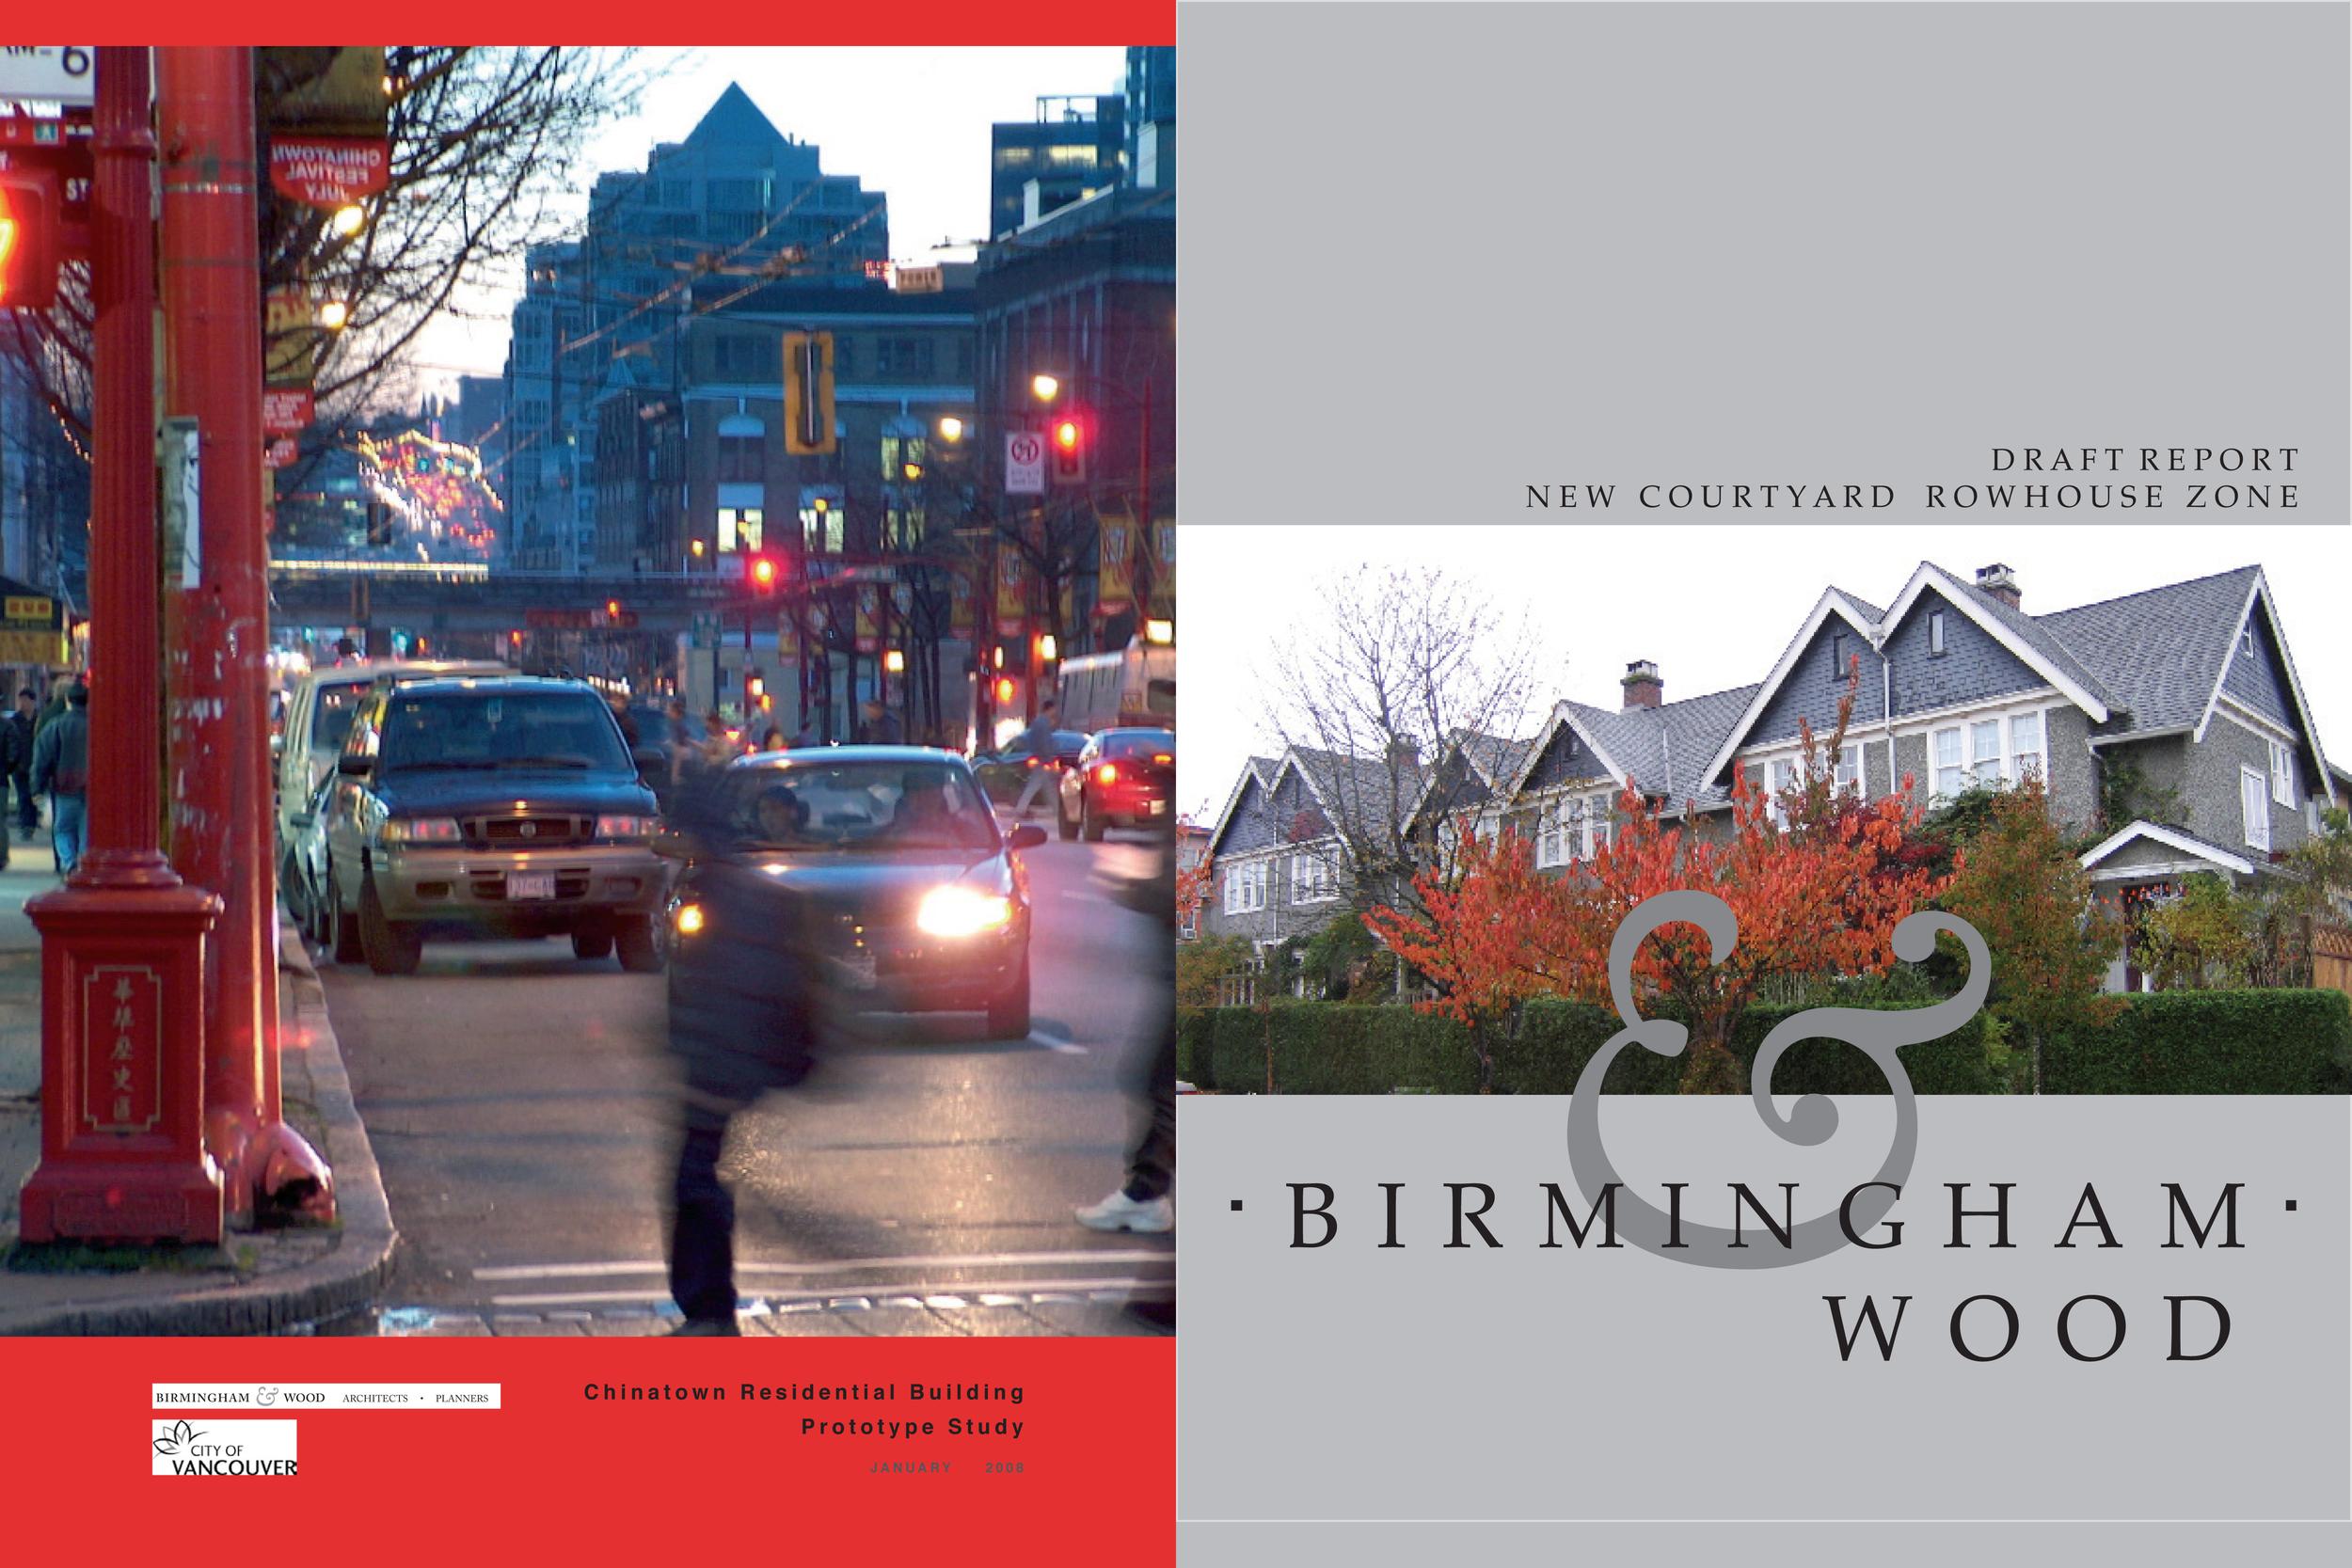 Urban Planning Studies